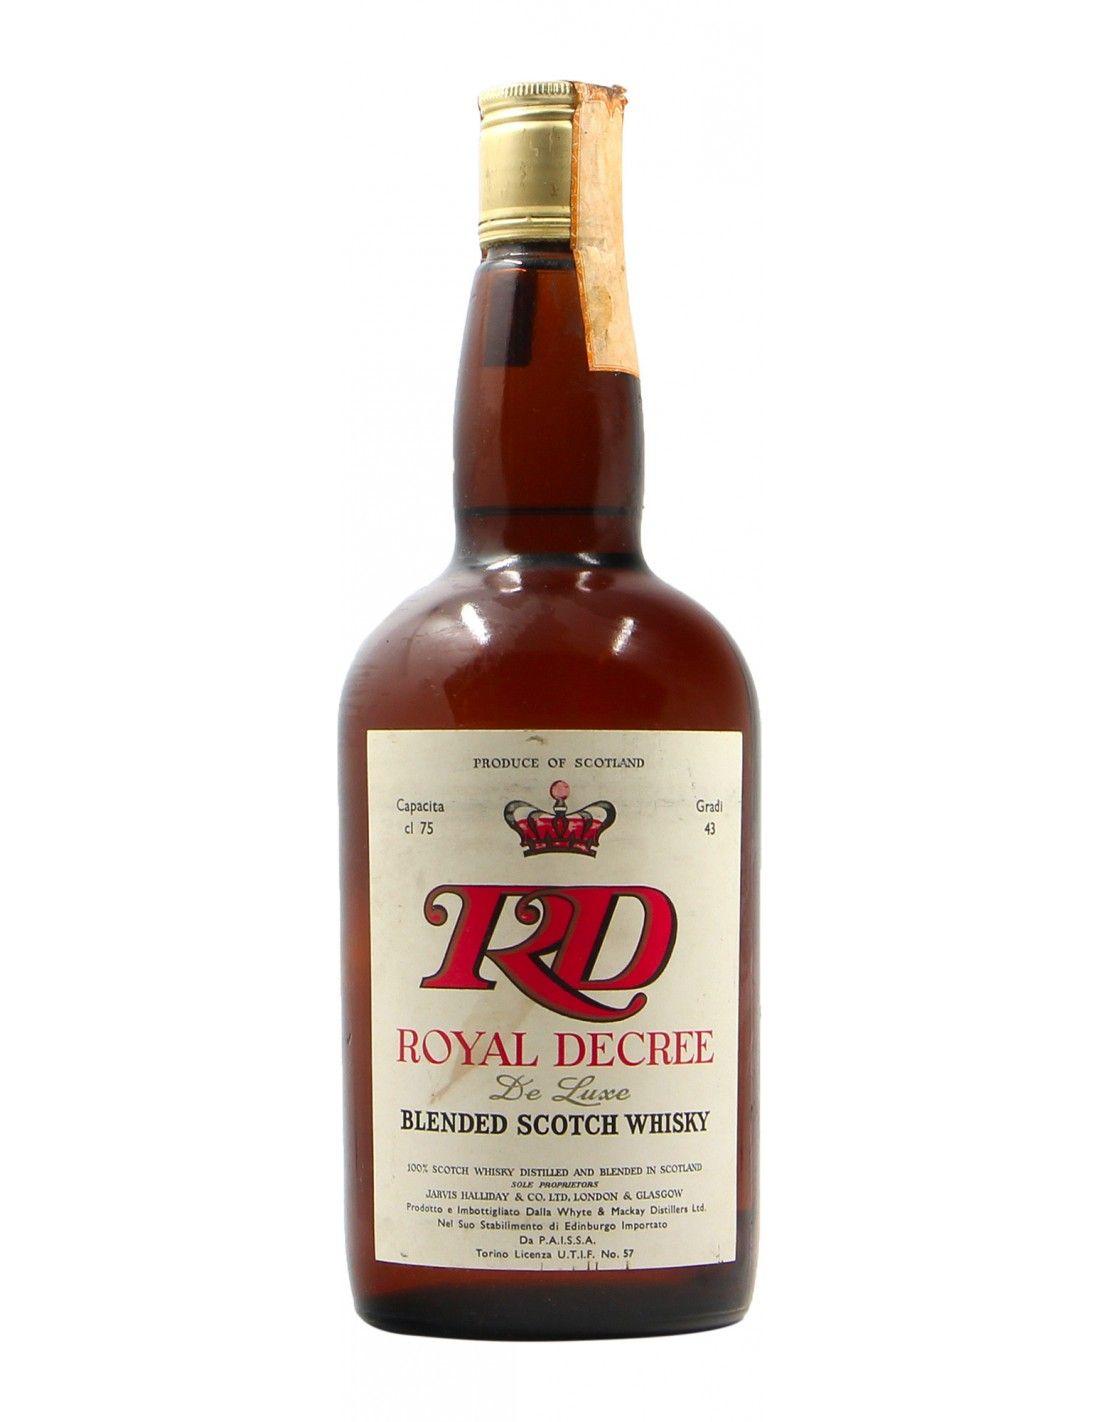 BLENDED SCOTCH WHISKY ROYAL DECREE 75CL NV ROYAL DECREE Grandi Bottiglie